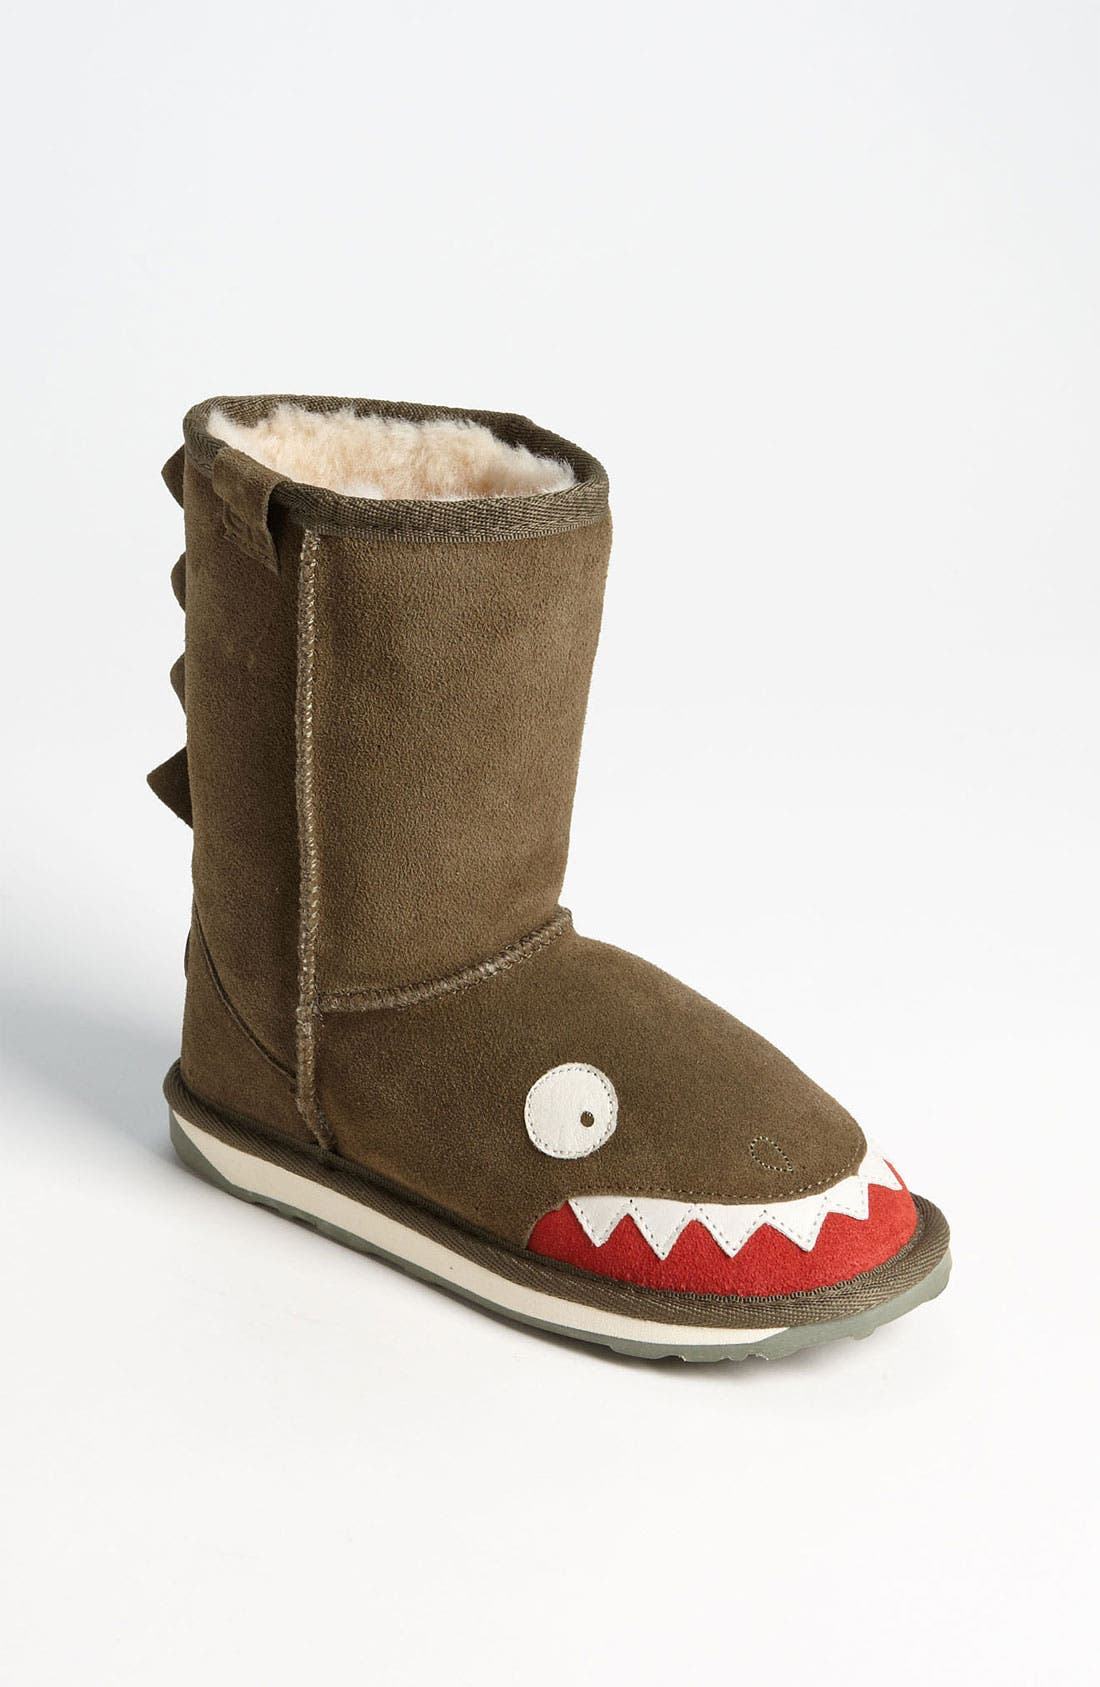 Alternate Image 1 Selected - EMU Australia 'Little Creatures - Croc' Boot (Toddler, Little Kid & Big Kid)